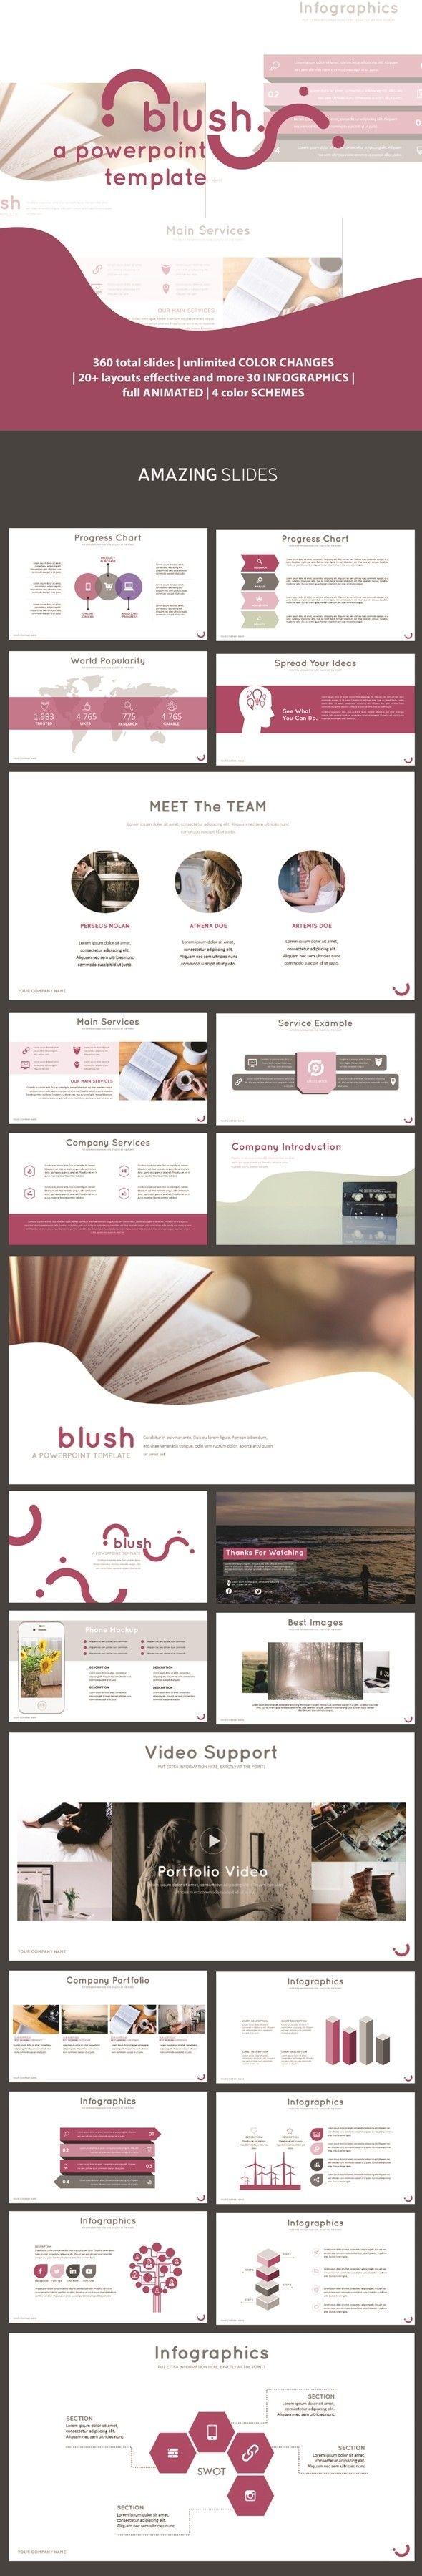 Blush PowerPoint Template